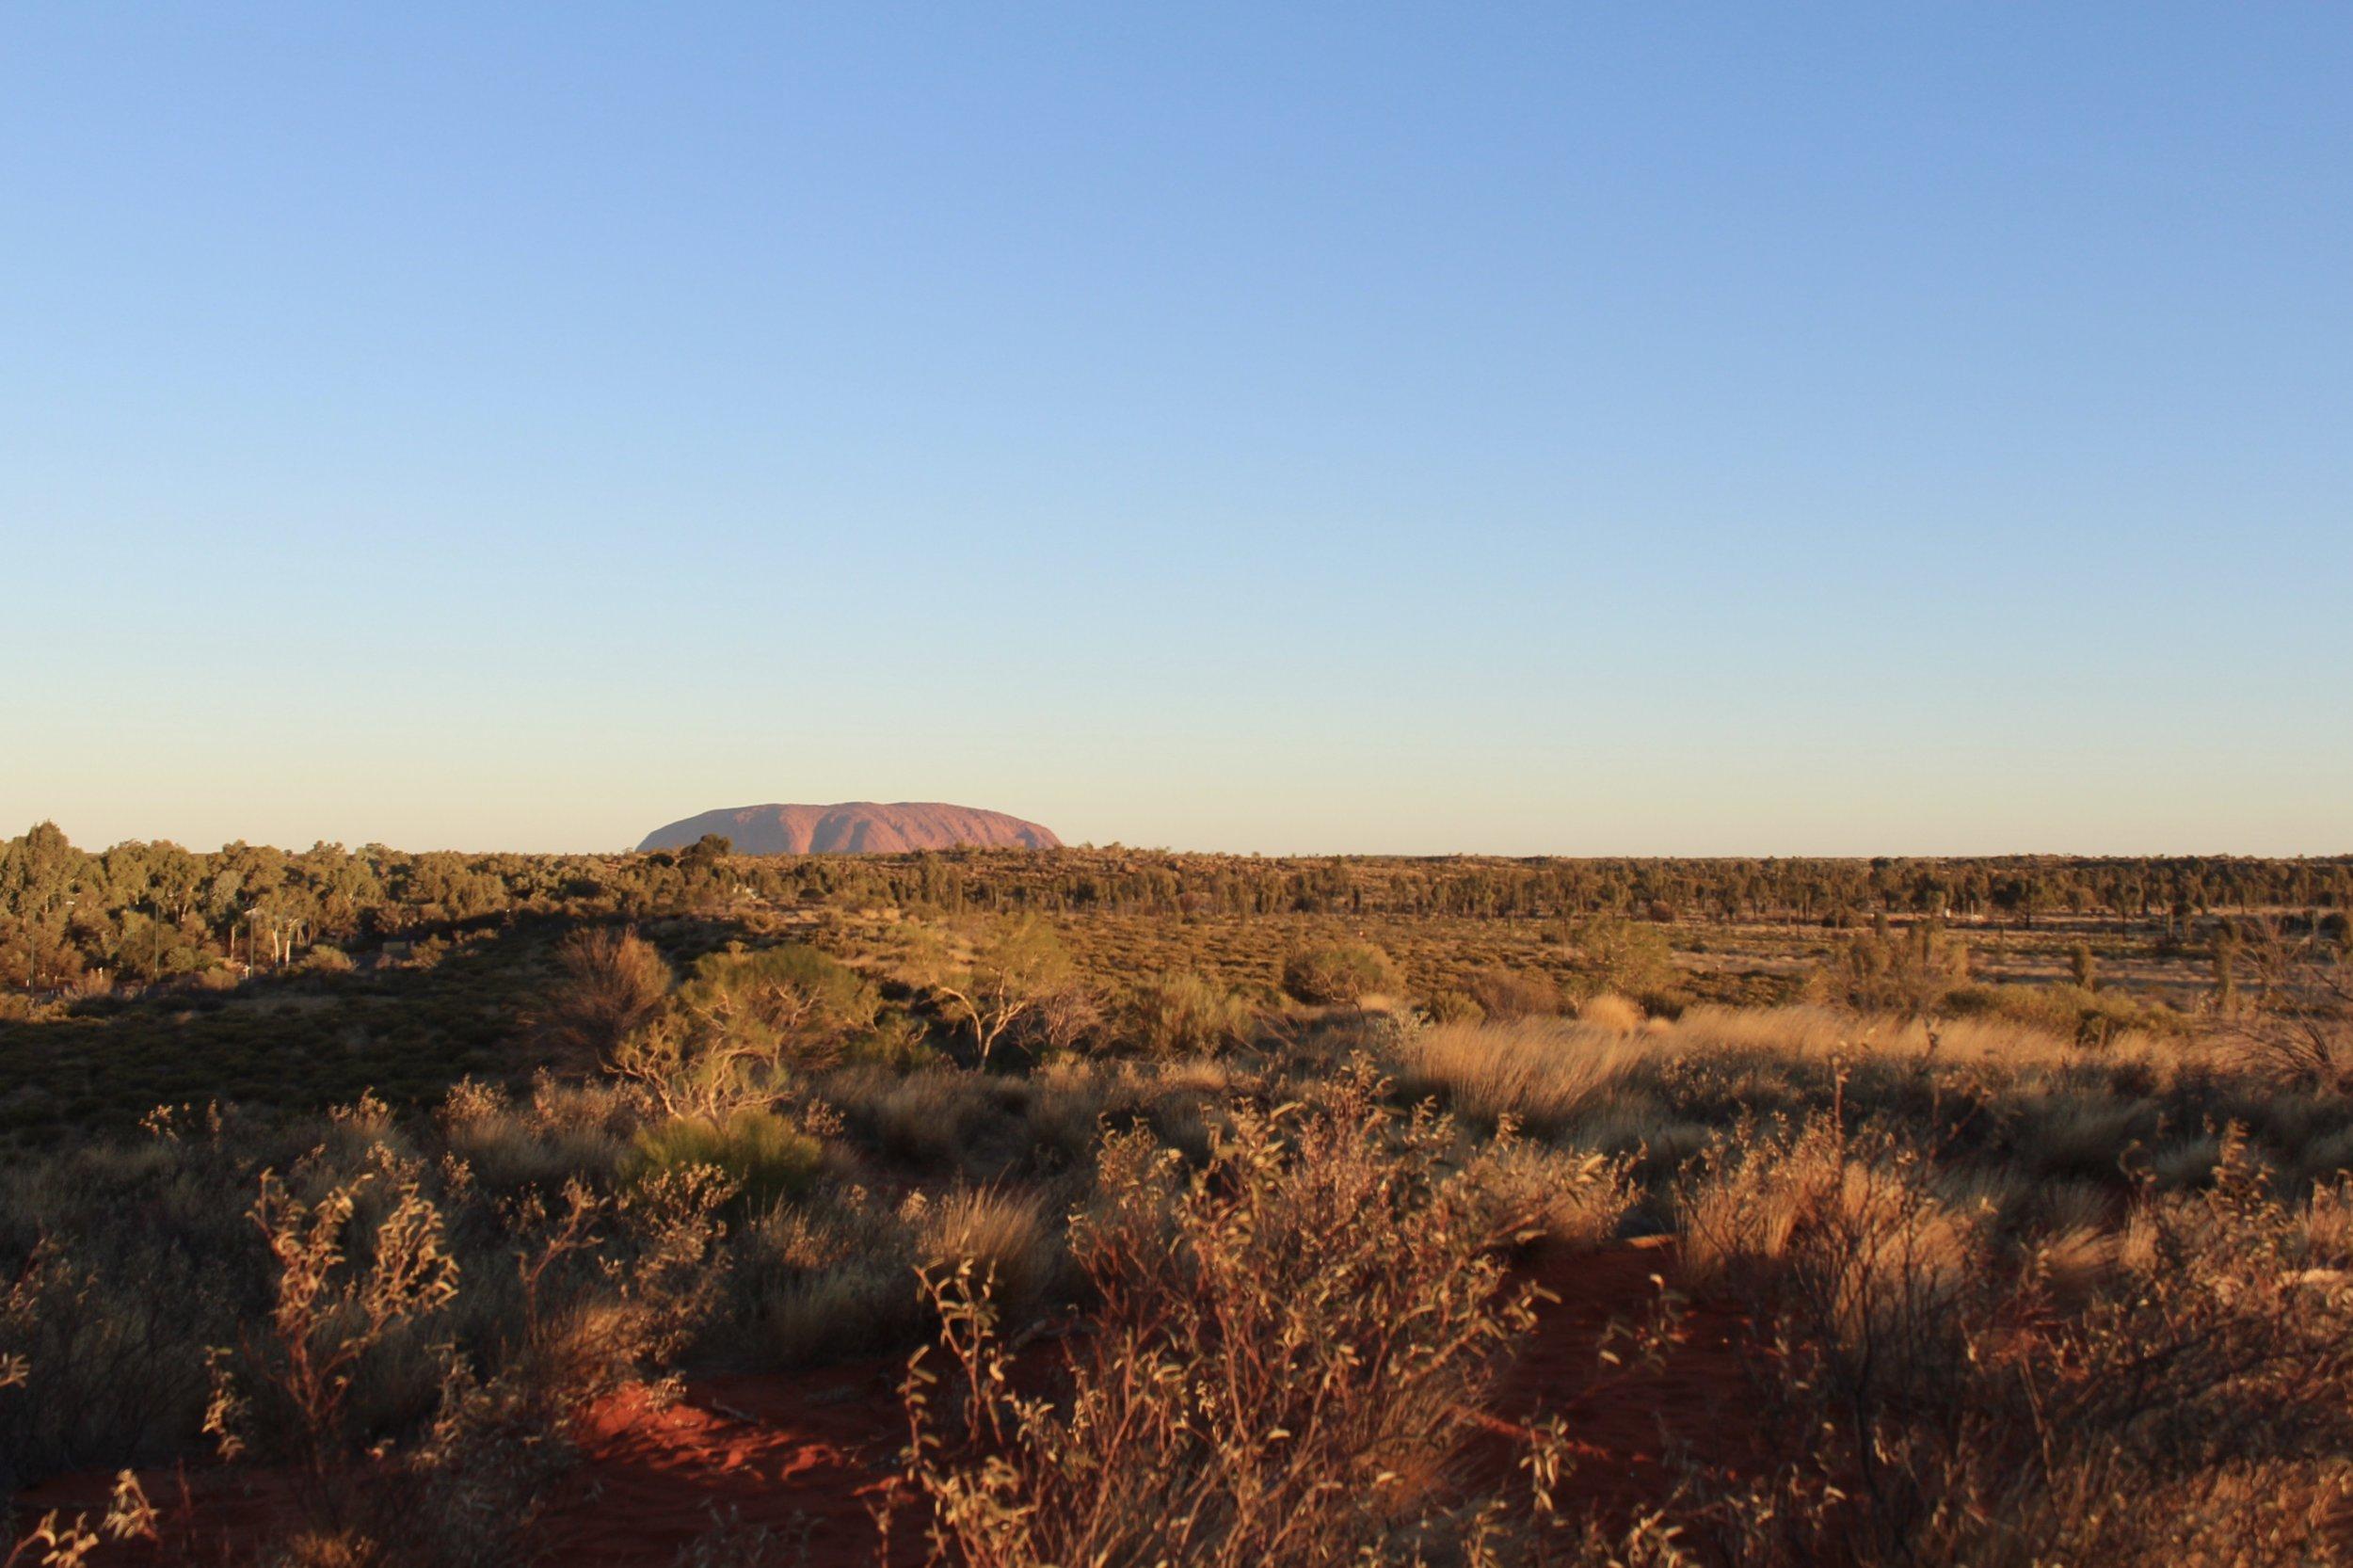 Uluru in the distance